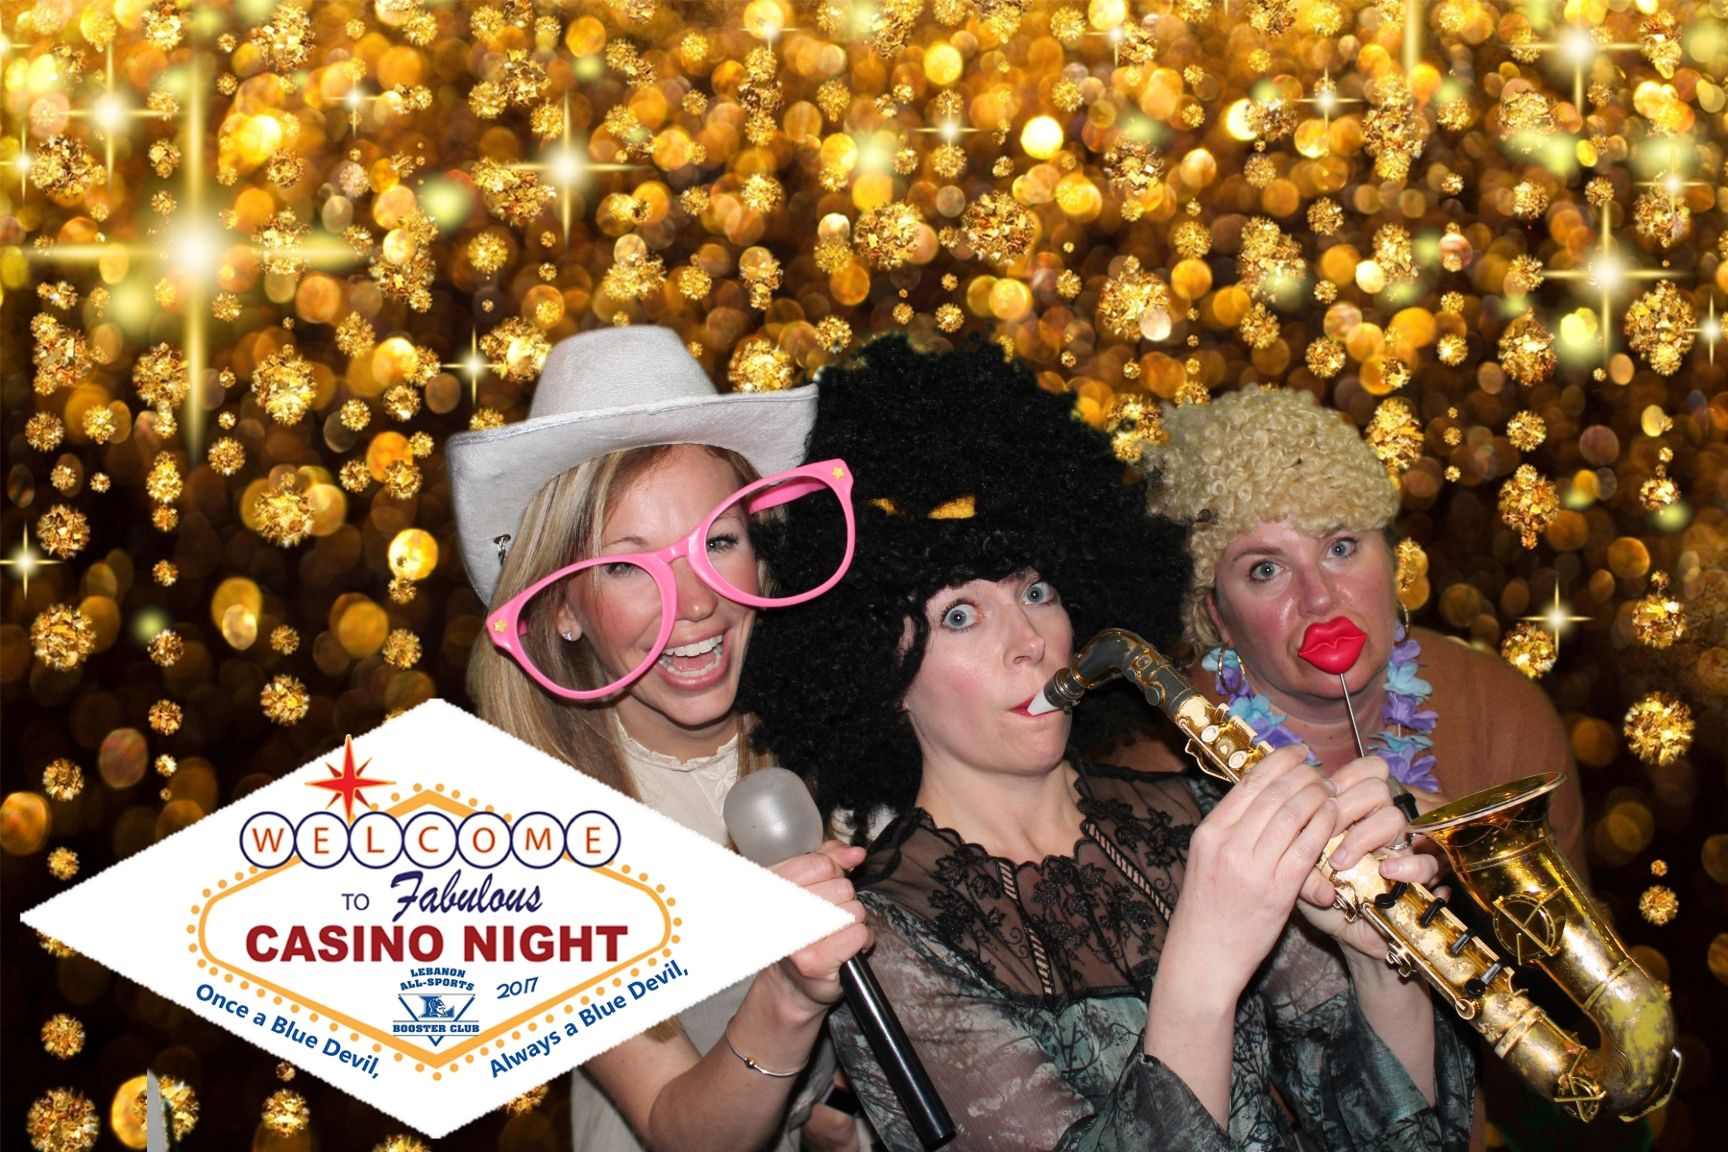 Blues casino night